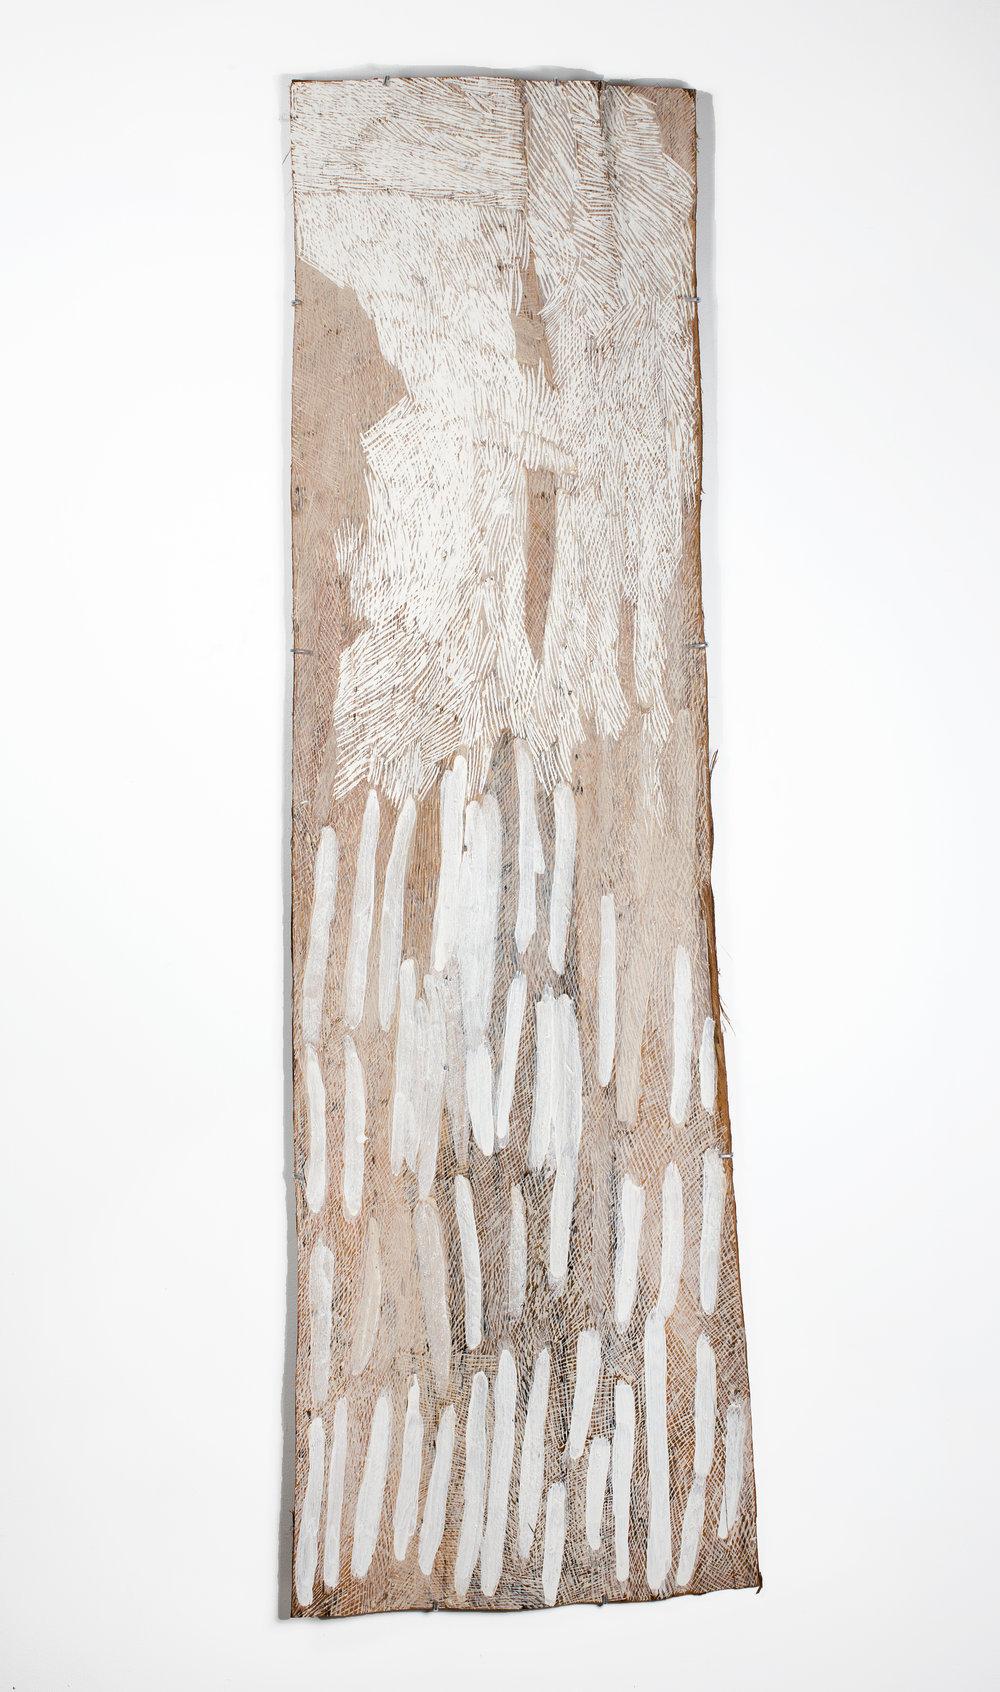 Nyapanyapa Yunupingu,Lines, 2016, bark painting, 192 x 59 cm. Courtesy the artist and Roslyn Oxley9 Gallery, Sydney.